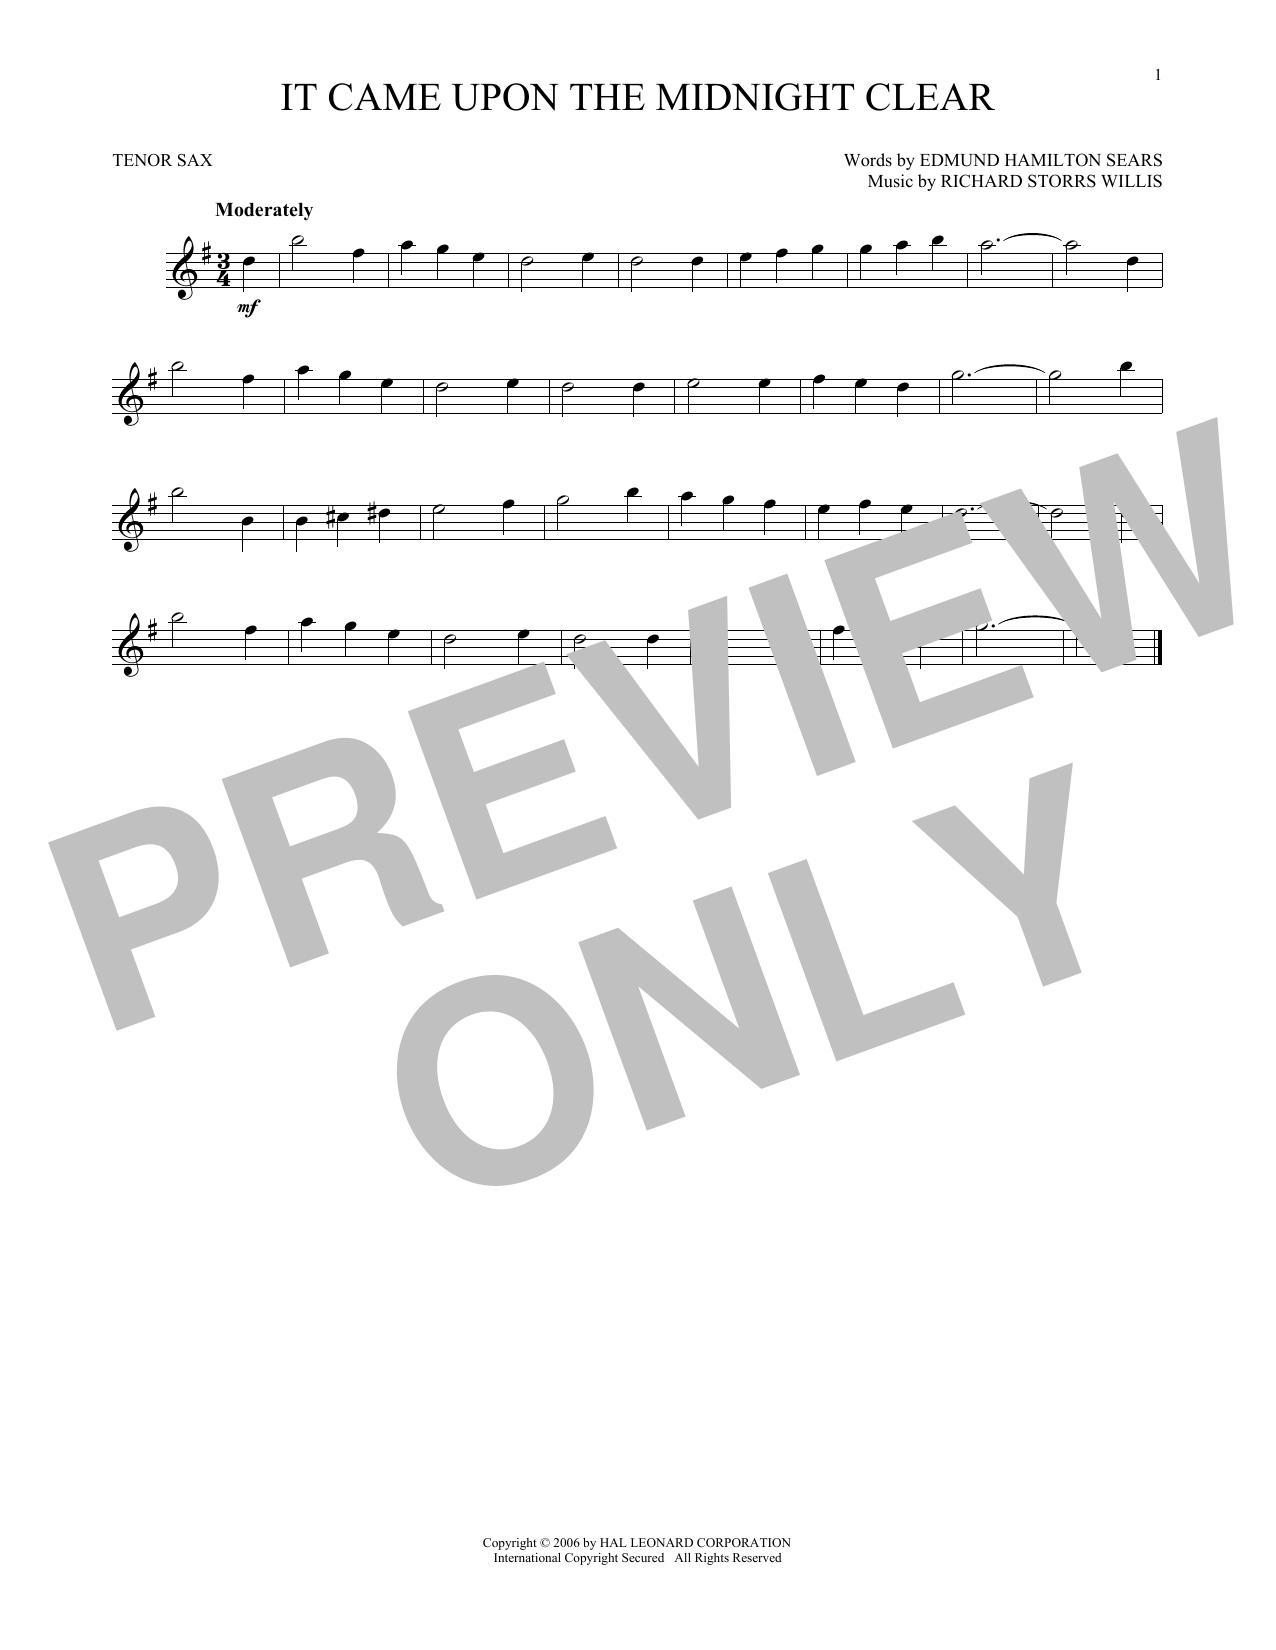 Partition saxophone It Came Upon The Midnight Clear de Edmund Hamilton Sears - Sax Tenor